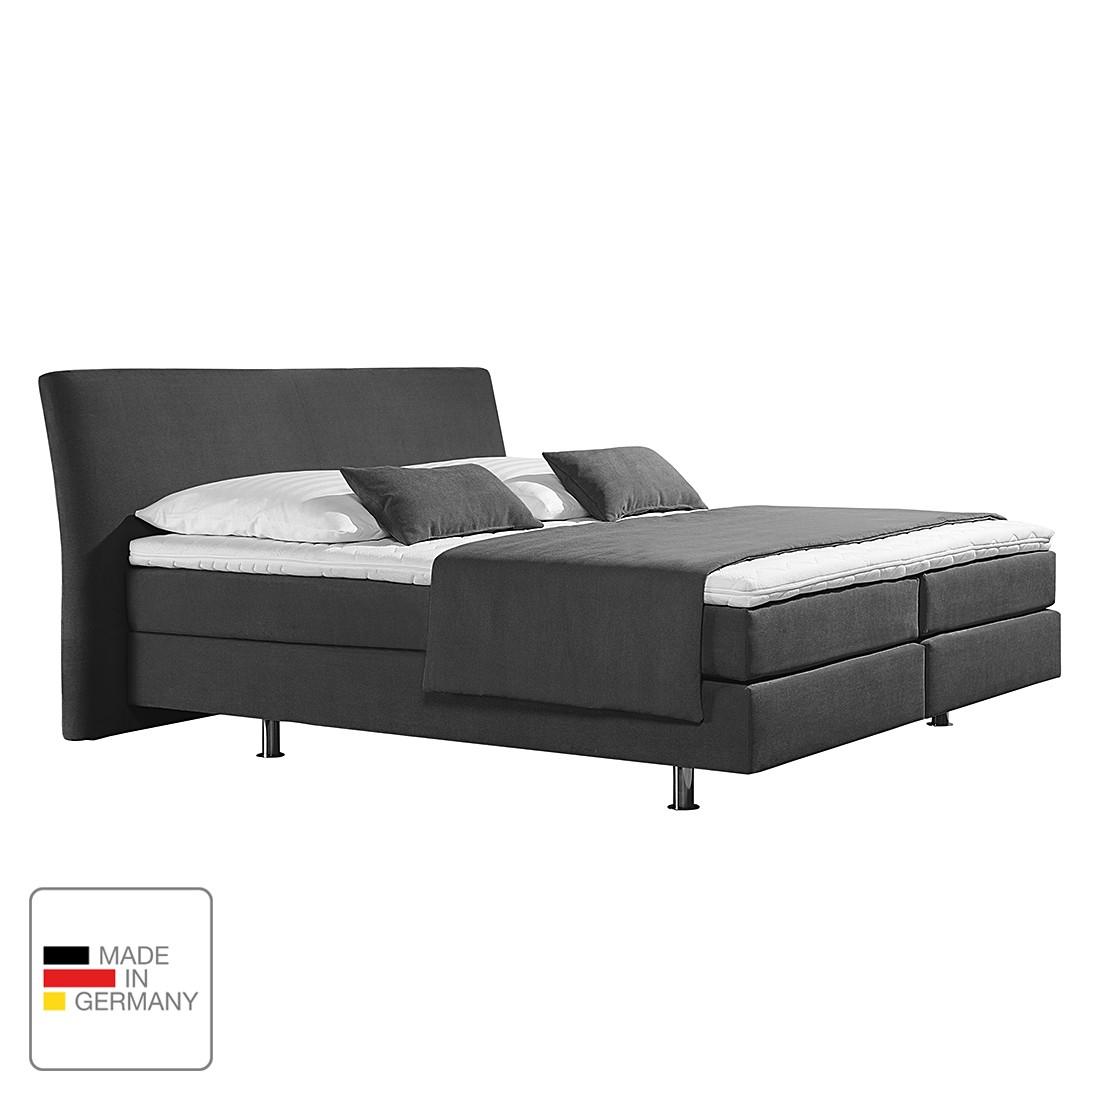 home24 Boxspringbett Cadis   Schlafzimmer > Betten   Grau   loftscape